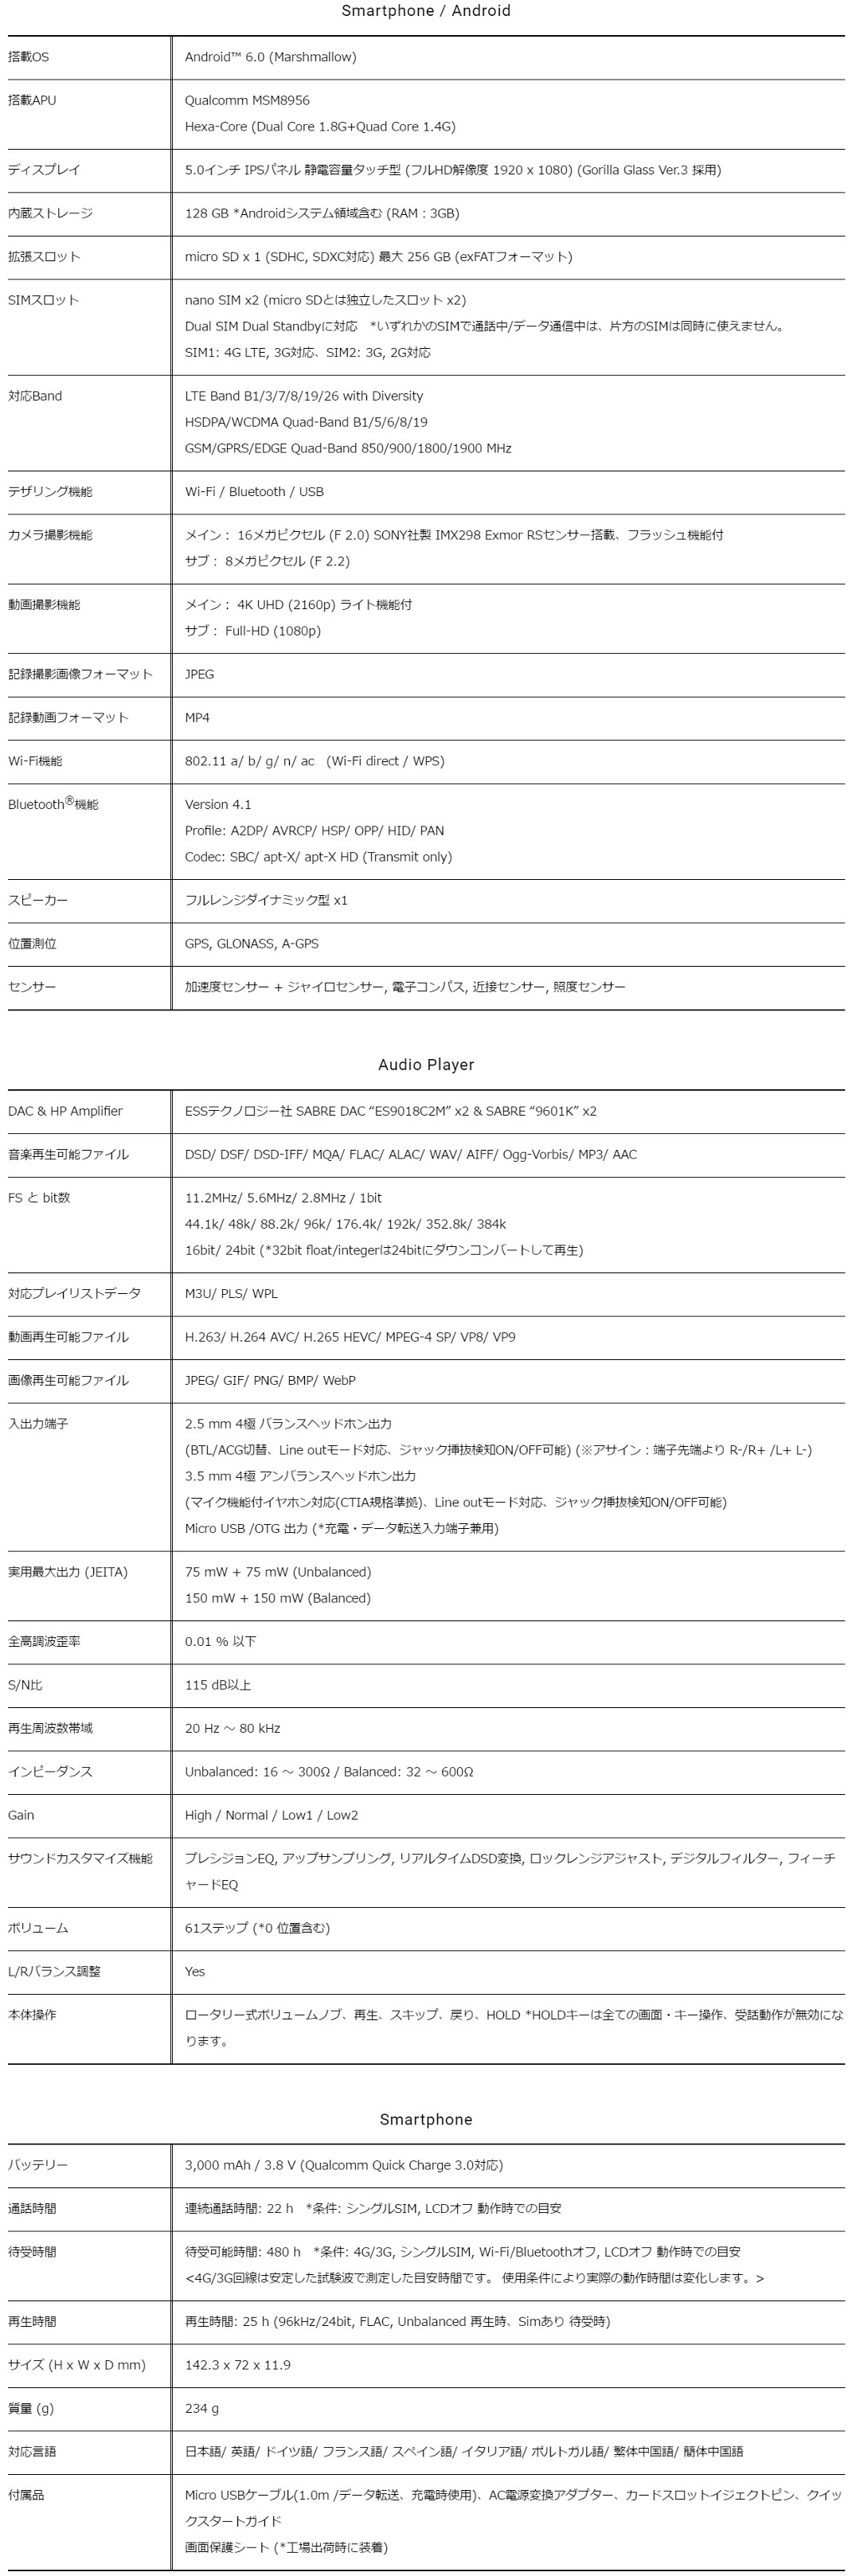 ONKYO GRANBEAT スペック表